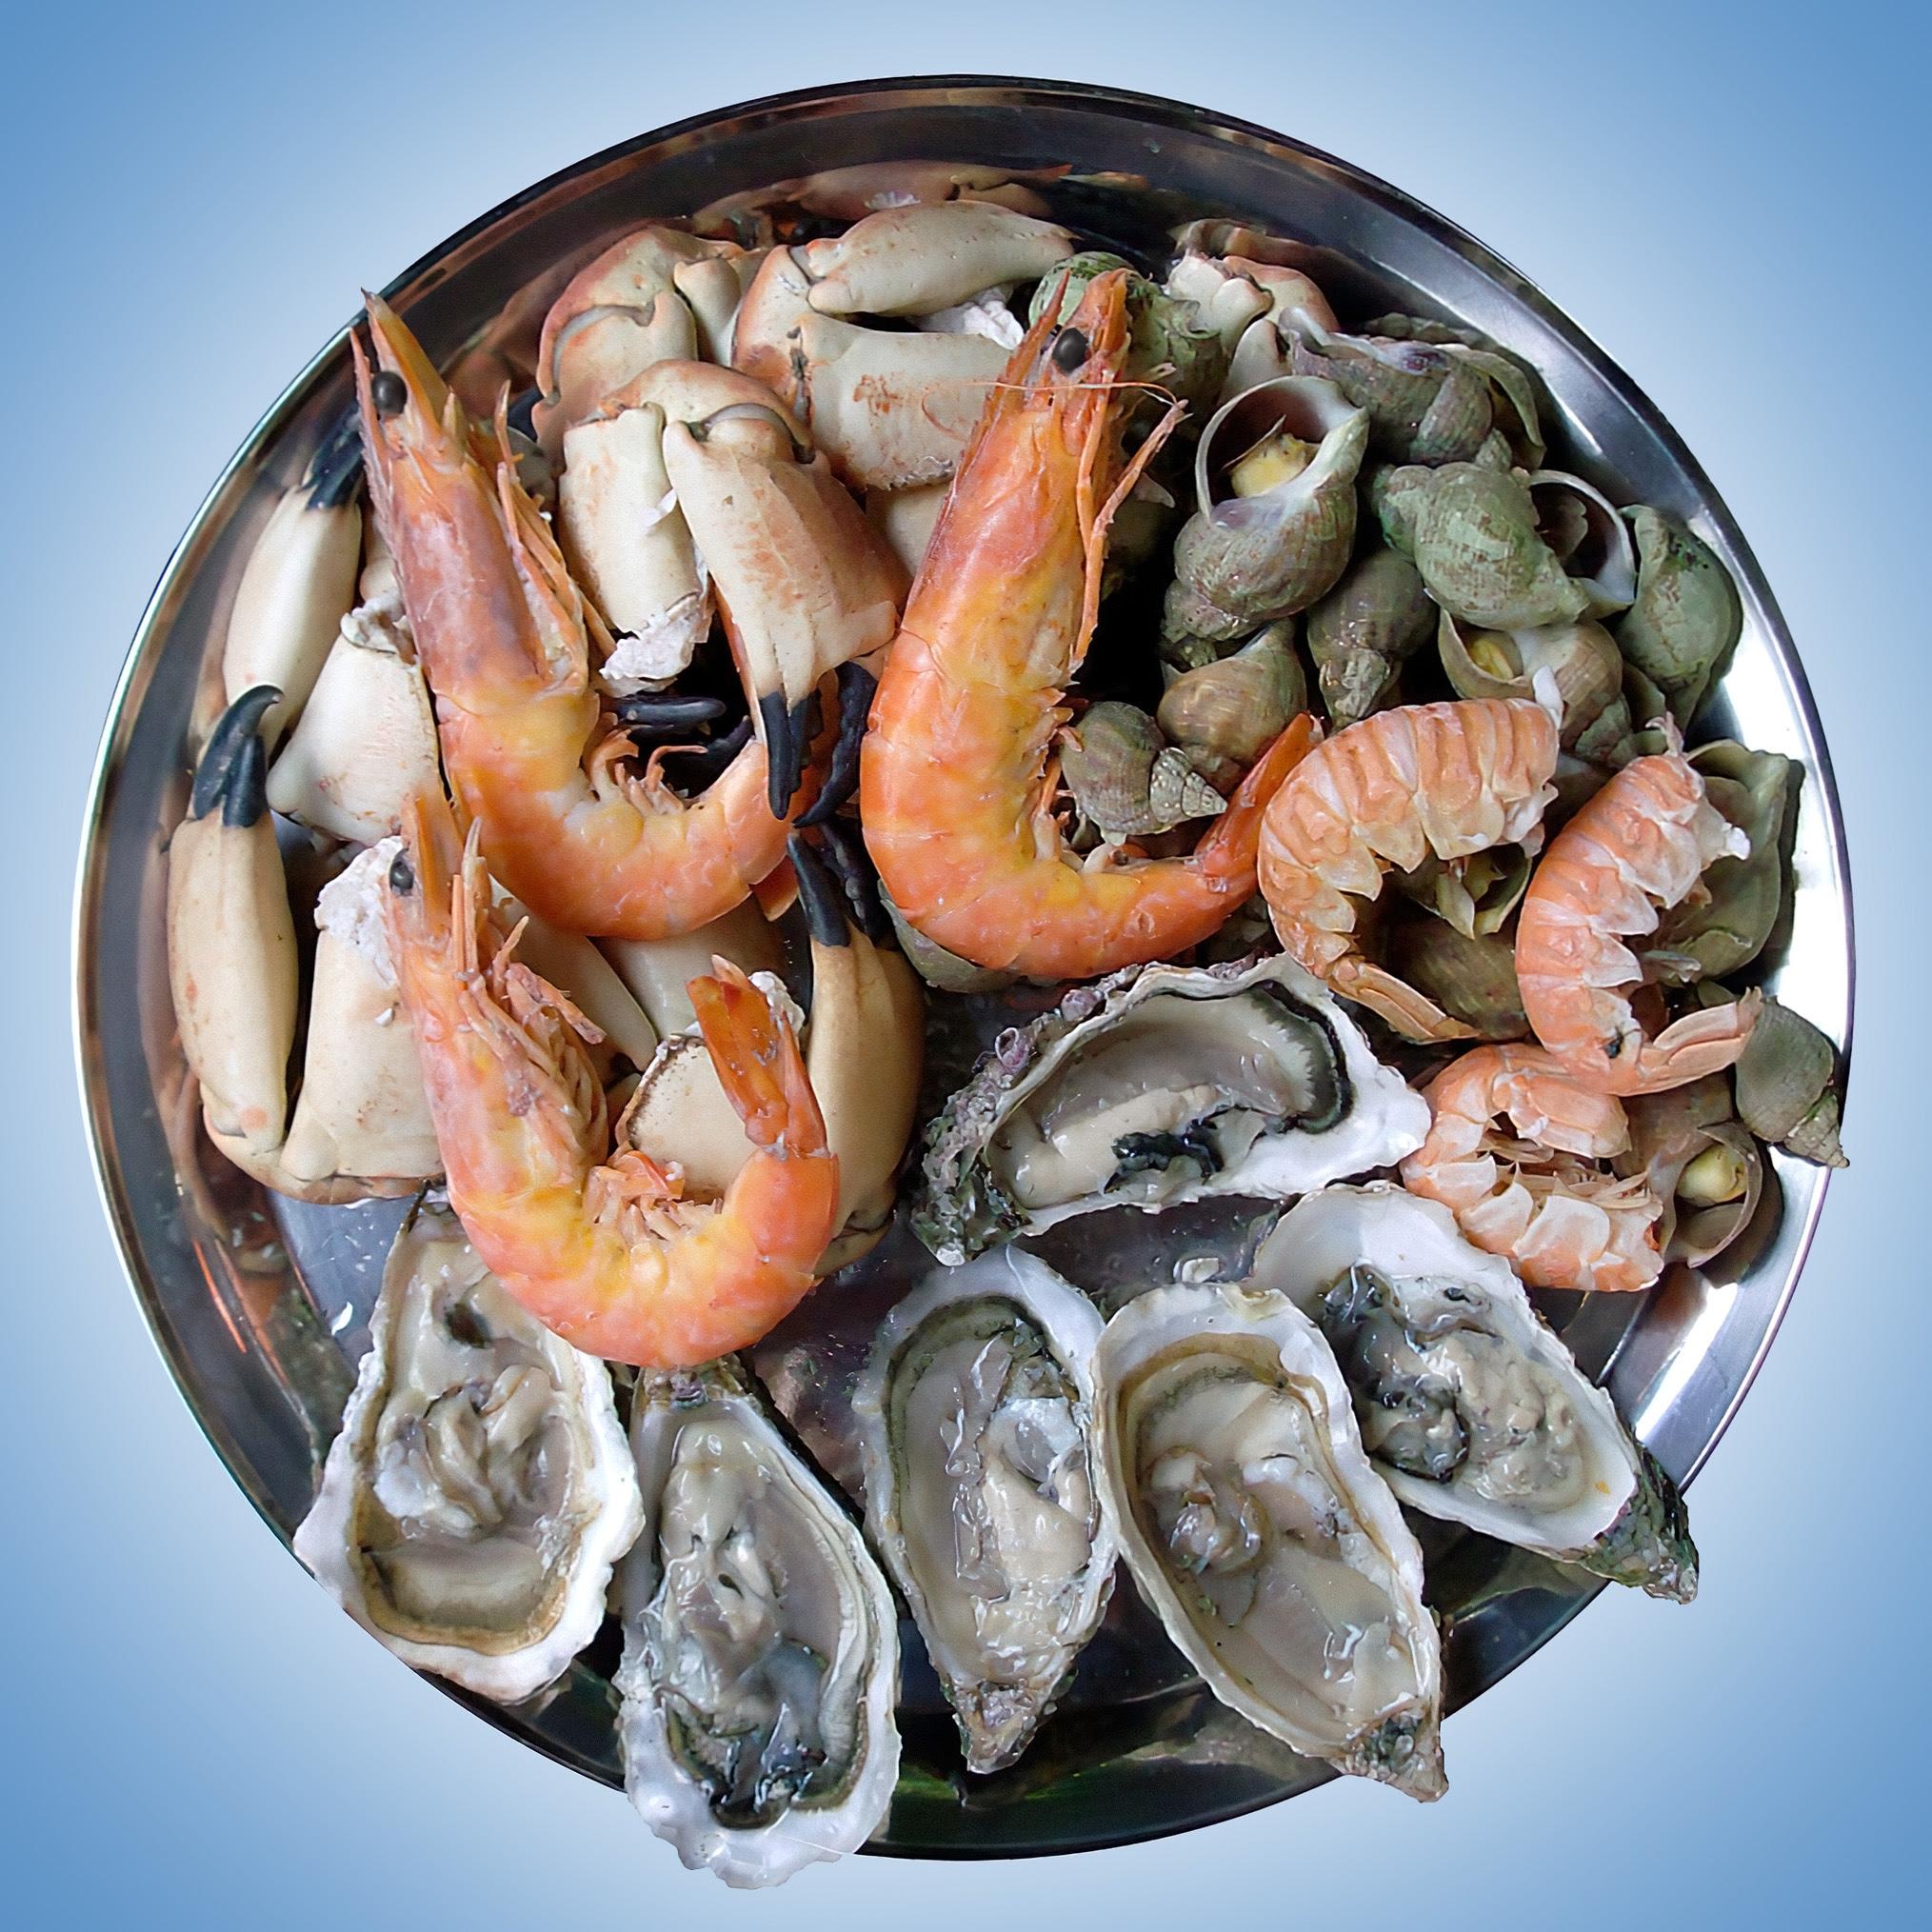 Plateau of seafood, image from Wikimedia